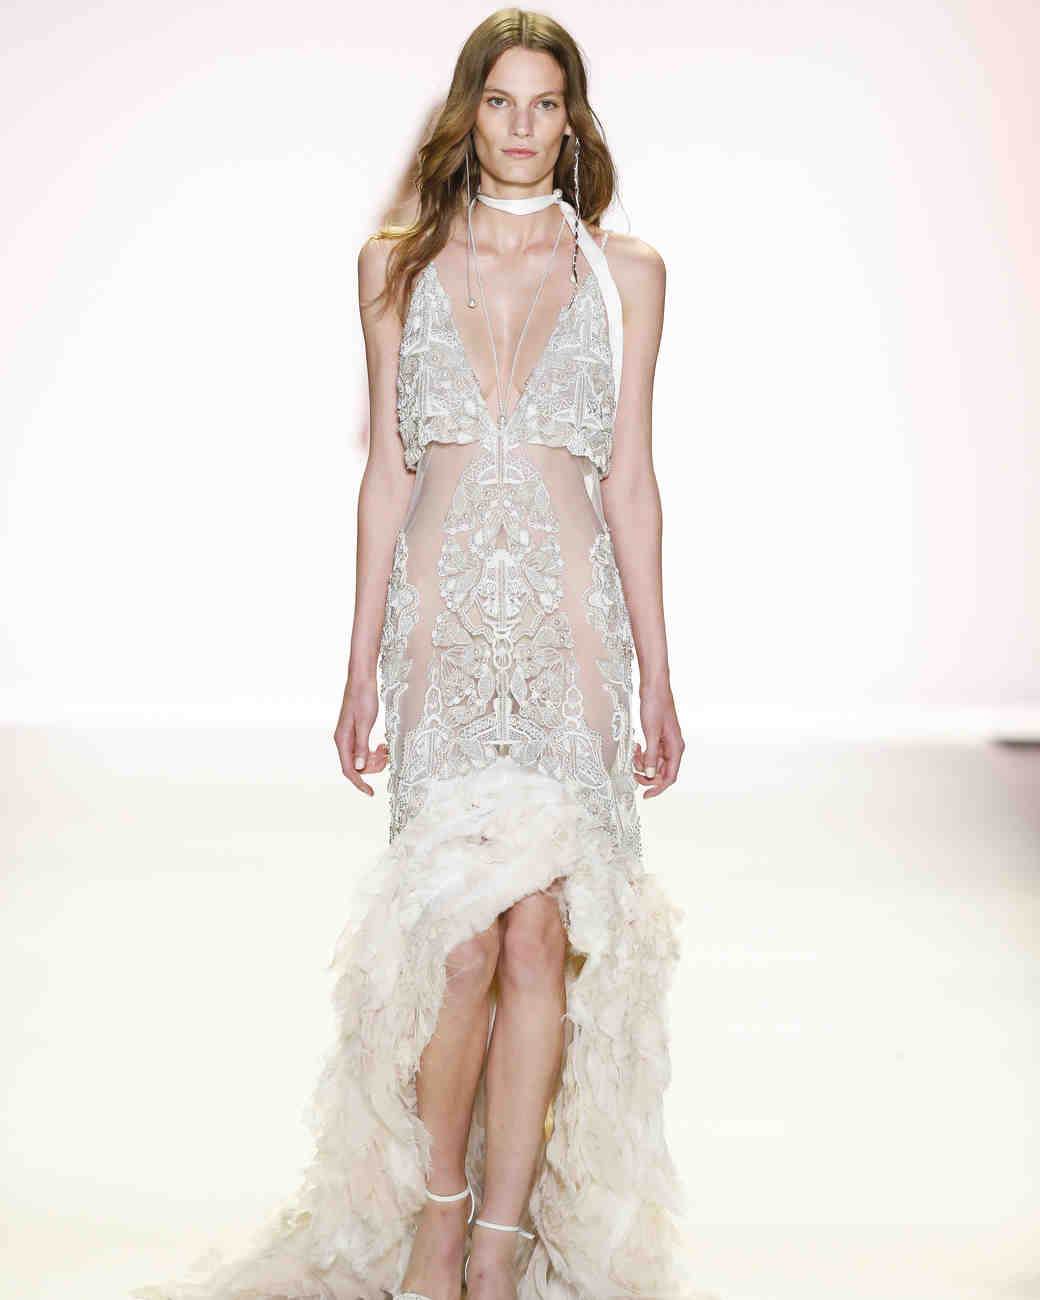 Jonathan Simkhai Favorite Dress Design Spring/Summer 2017